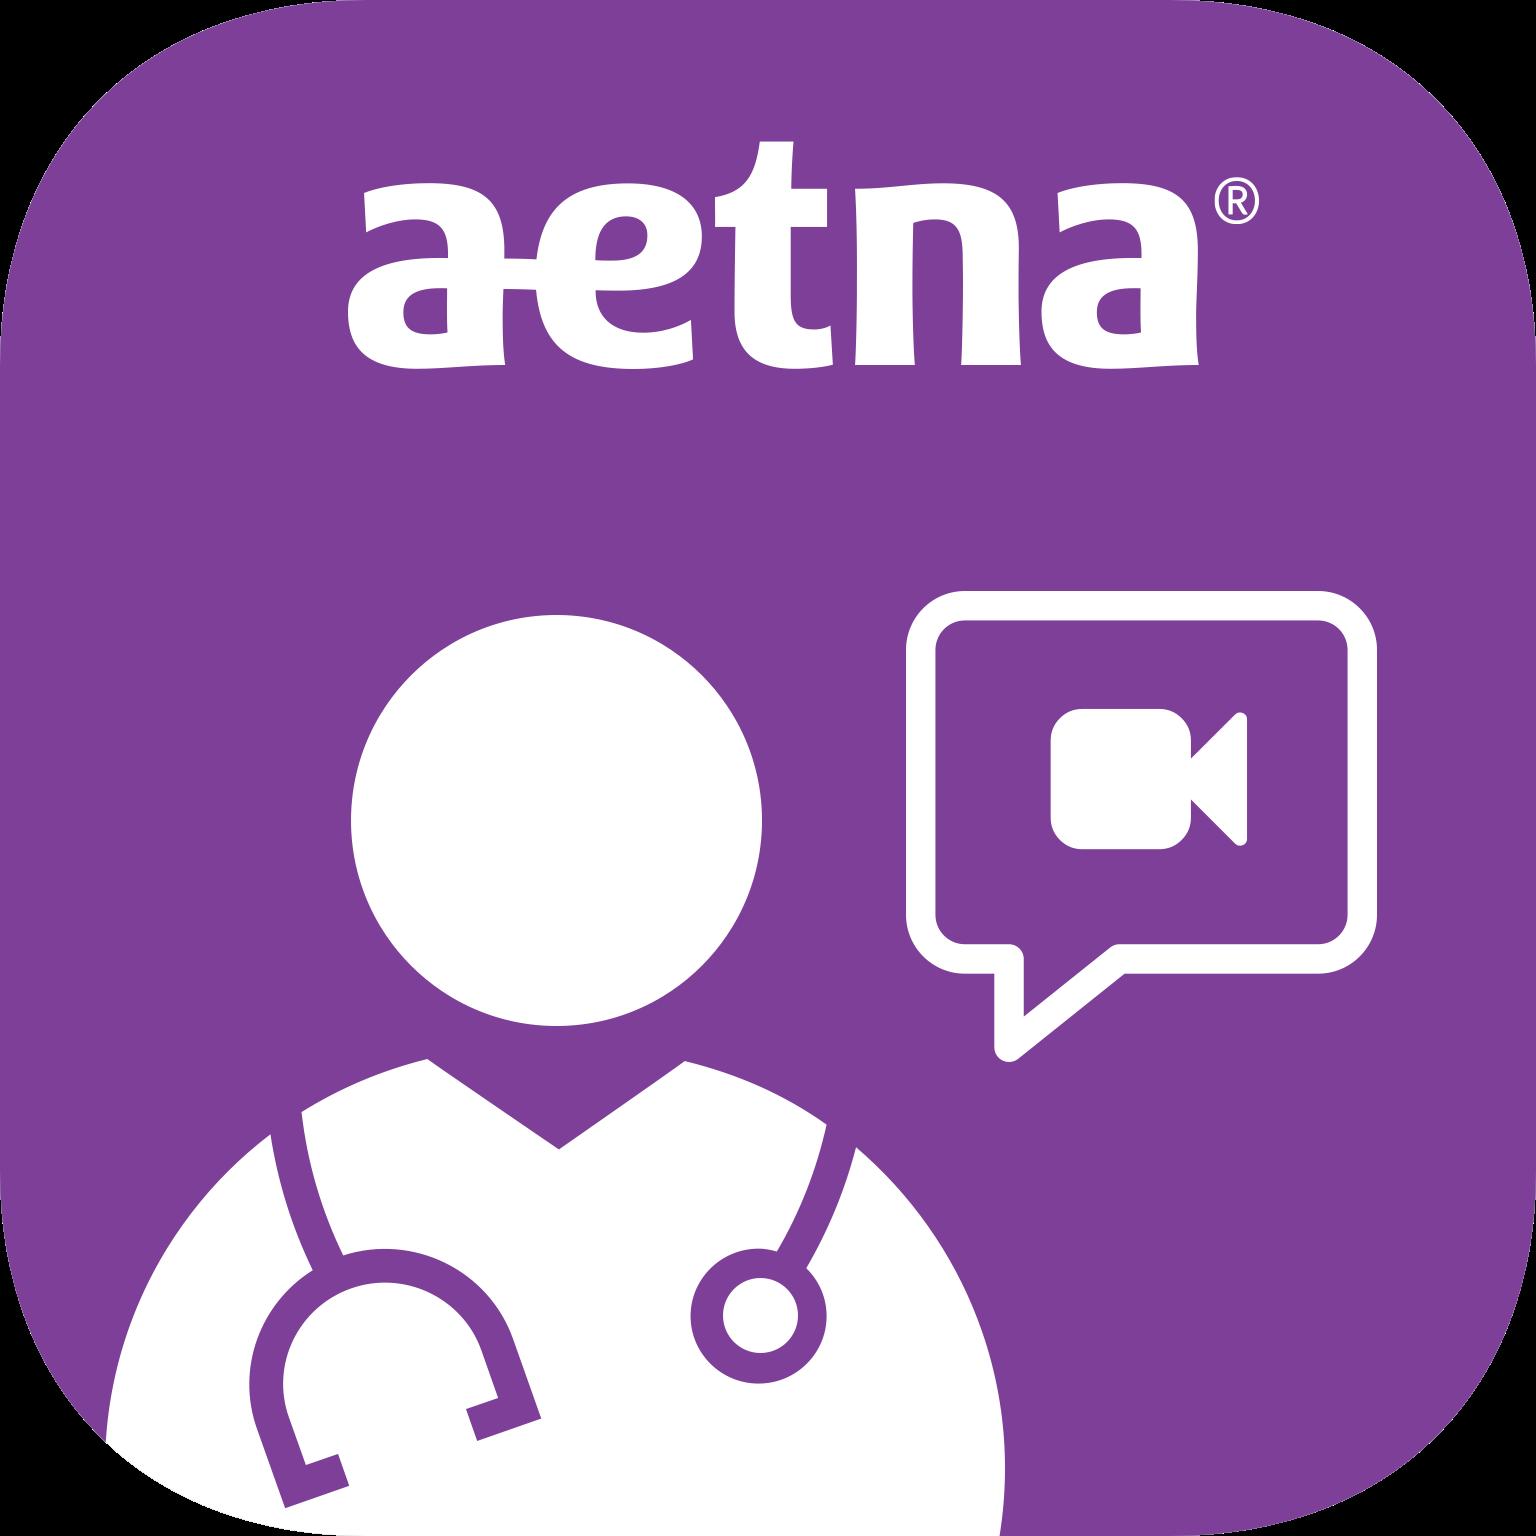 vHealth by Aetna App